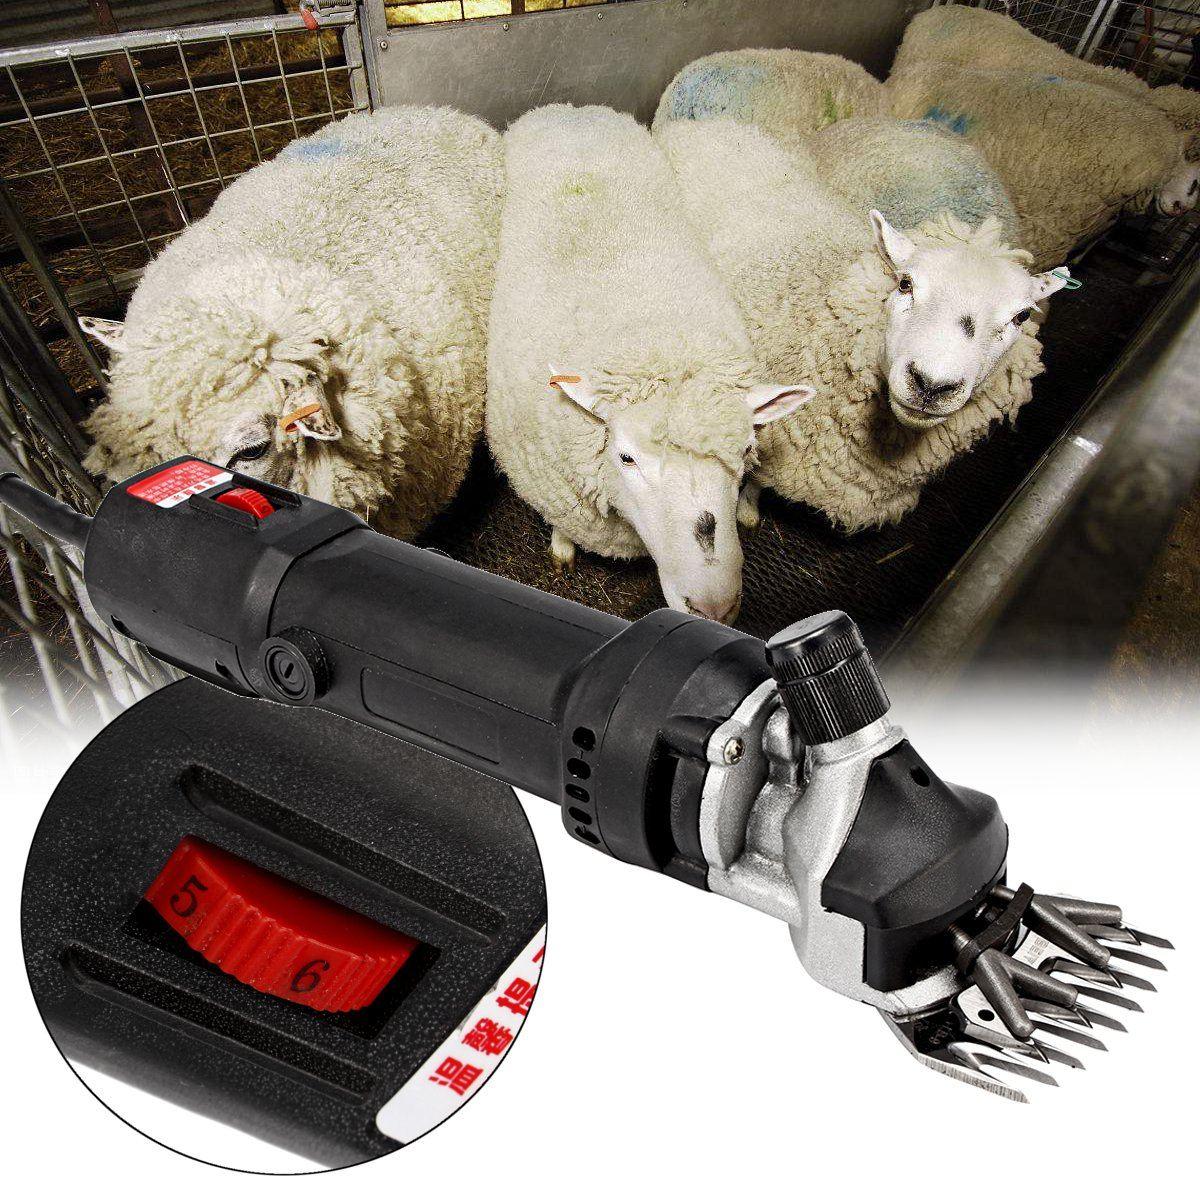 690W 6 Level Speed Electric Shears Shearing Hair Clipper Animal Sheep Goat Pet Farm Machine Scissor